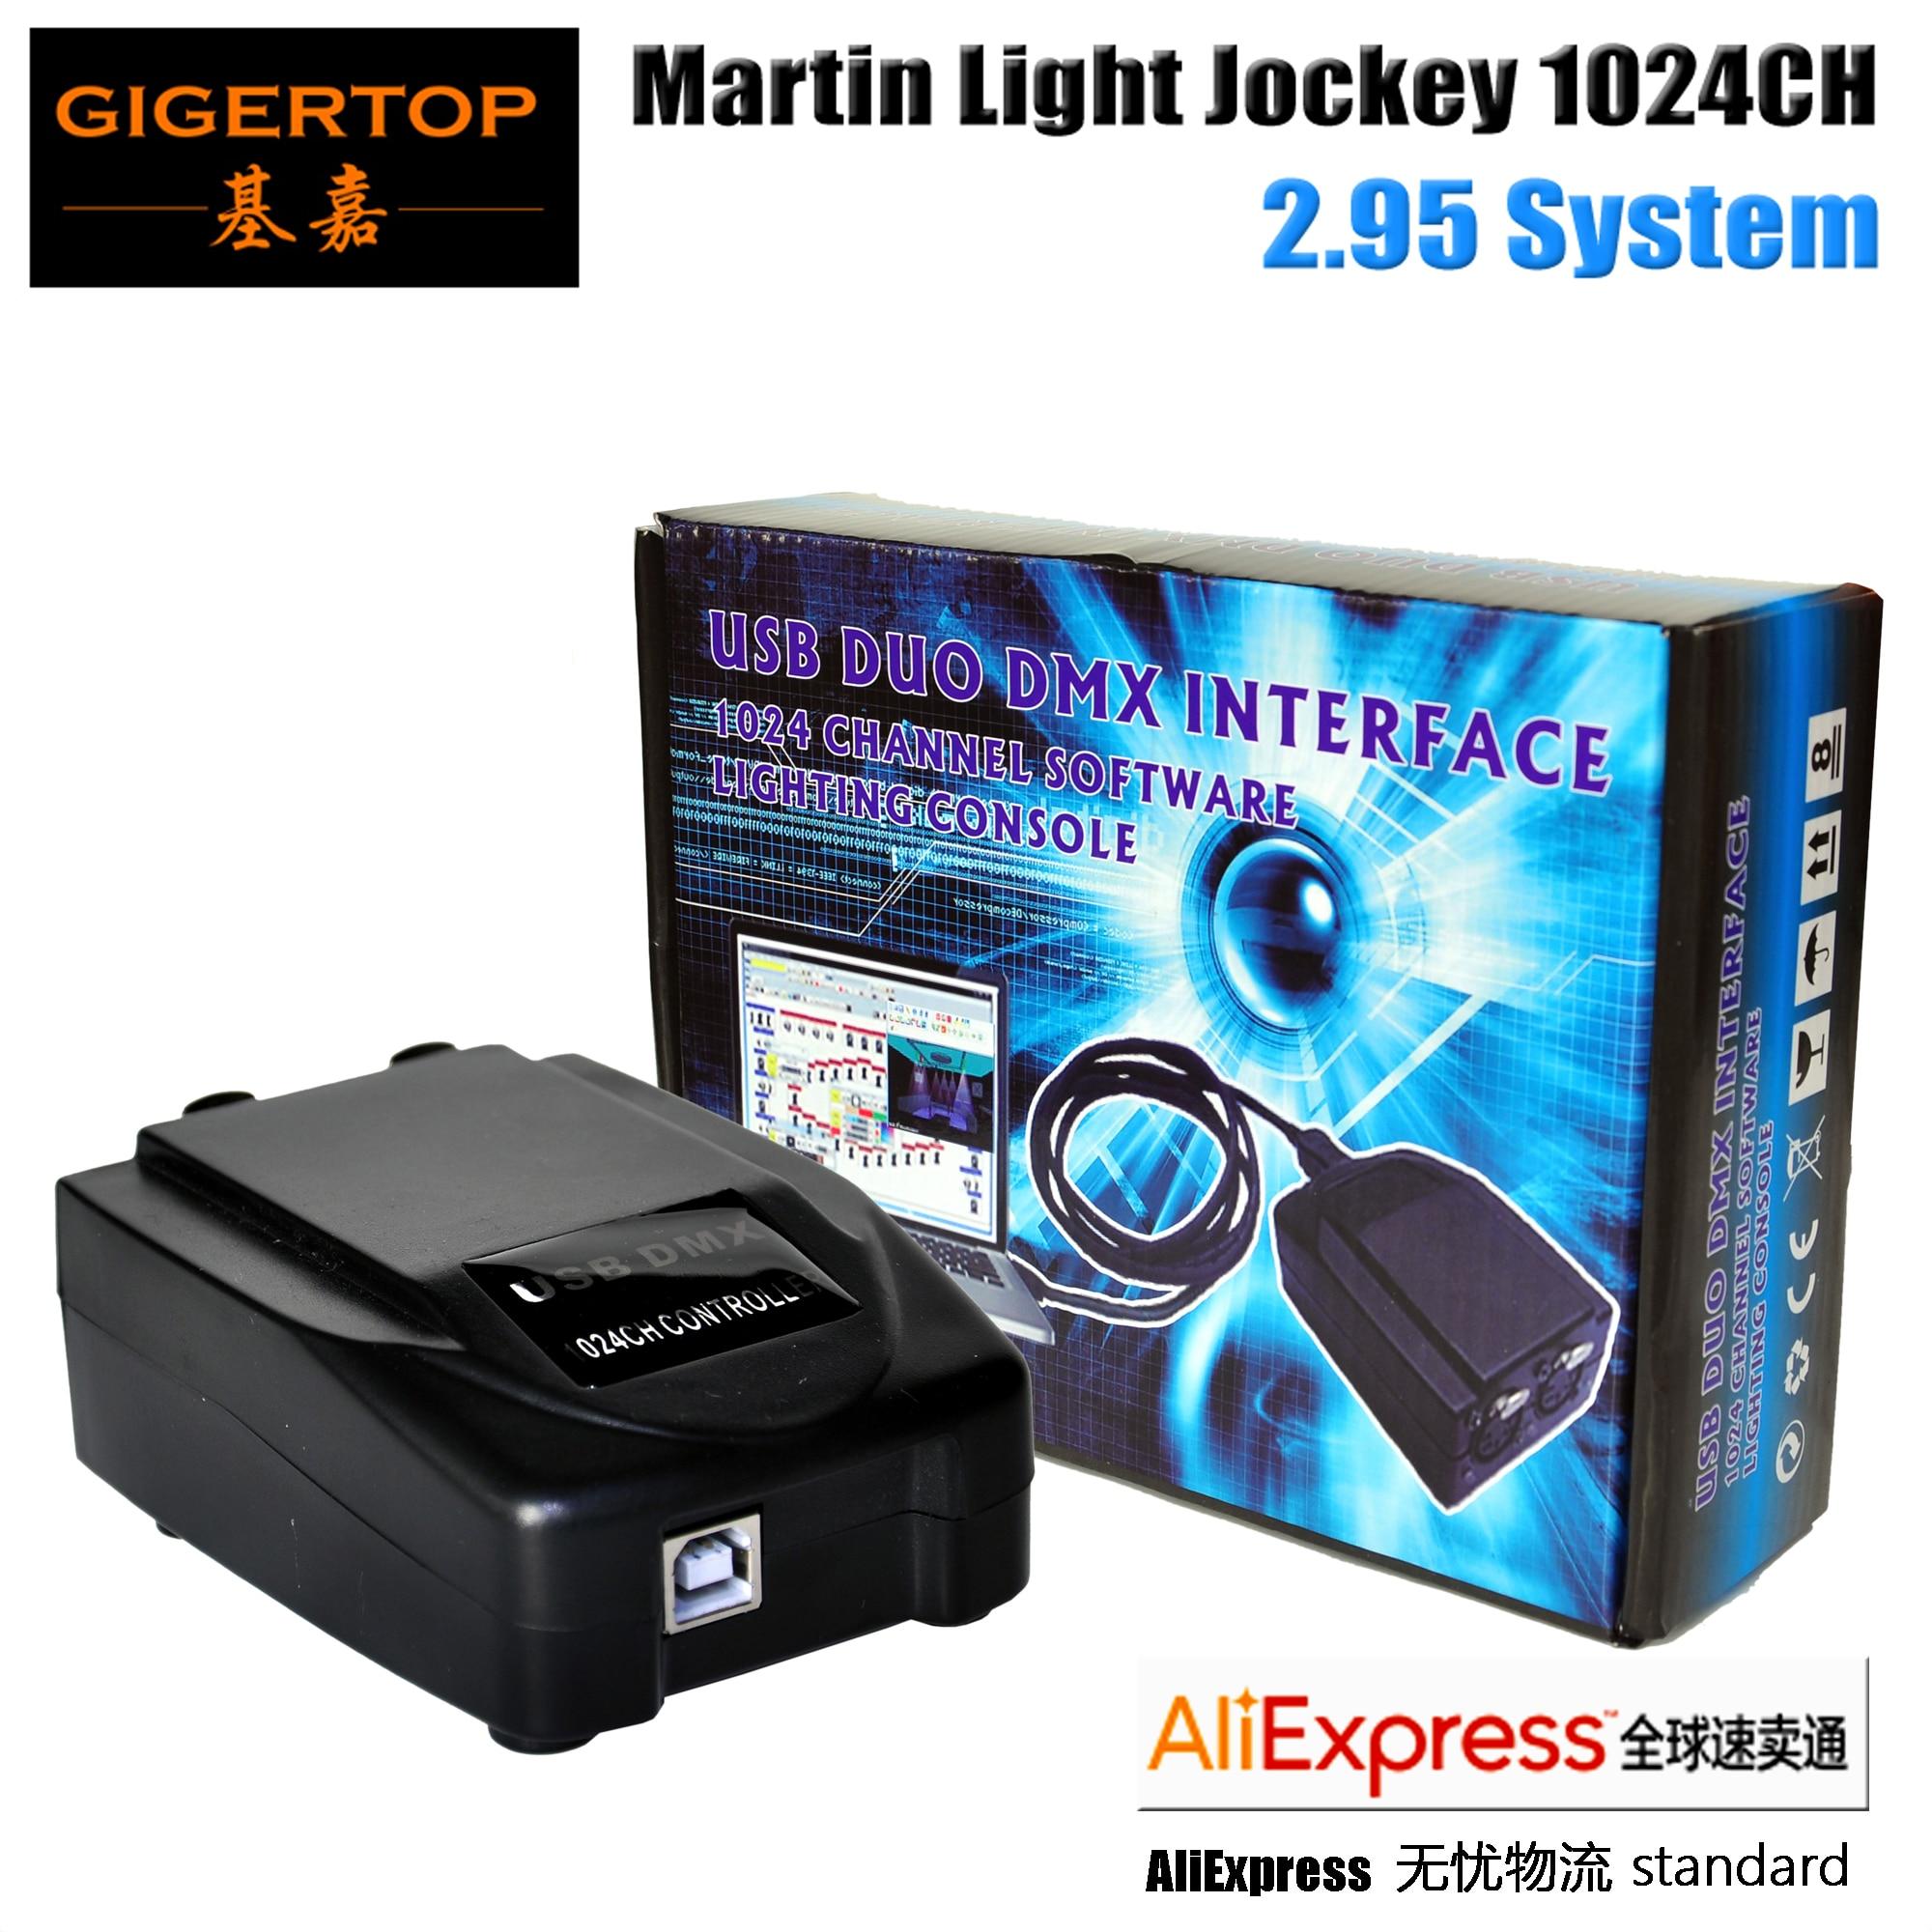 Orignal Martin Light Jockey USB 2.95 DMX Interface 1024 Channel Software USB DMX PC 3D Stage Lighting Controller Software